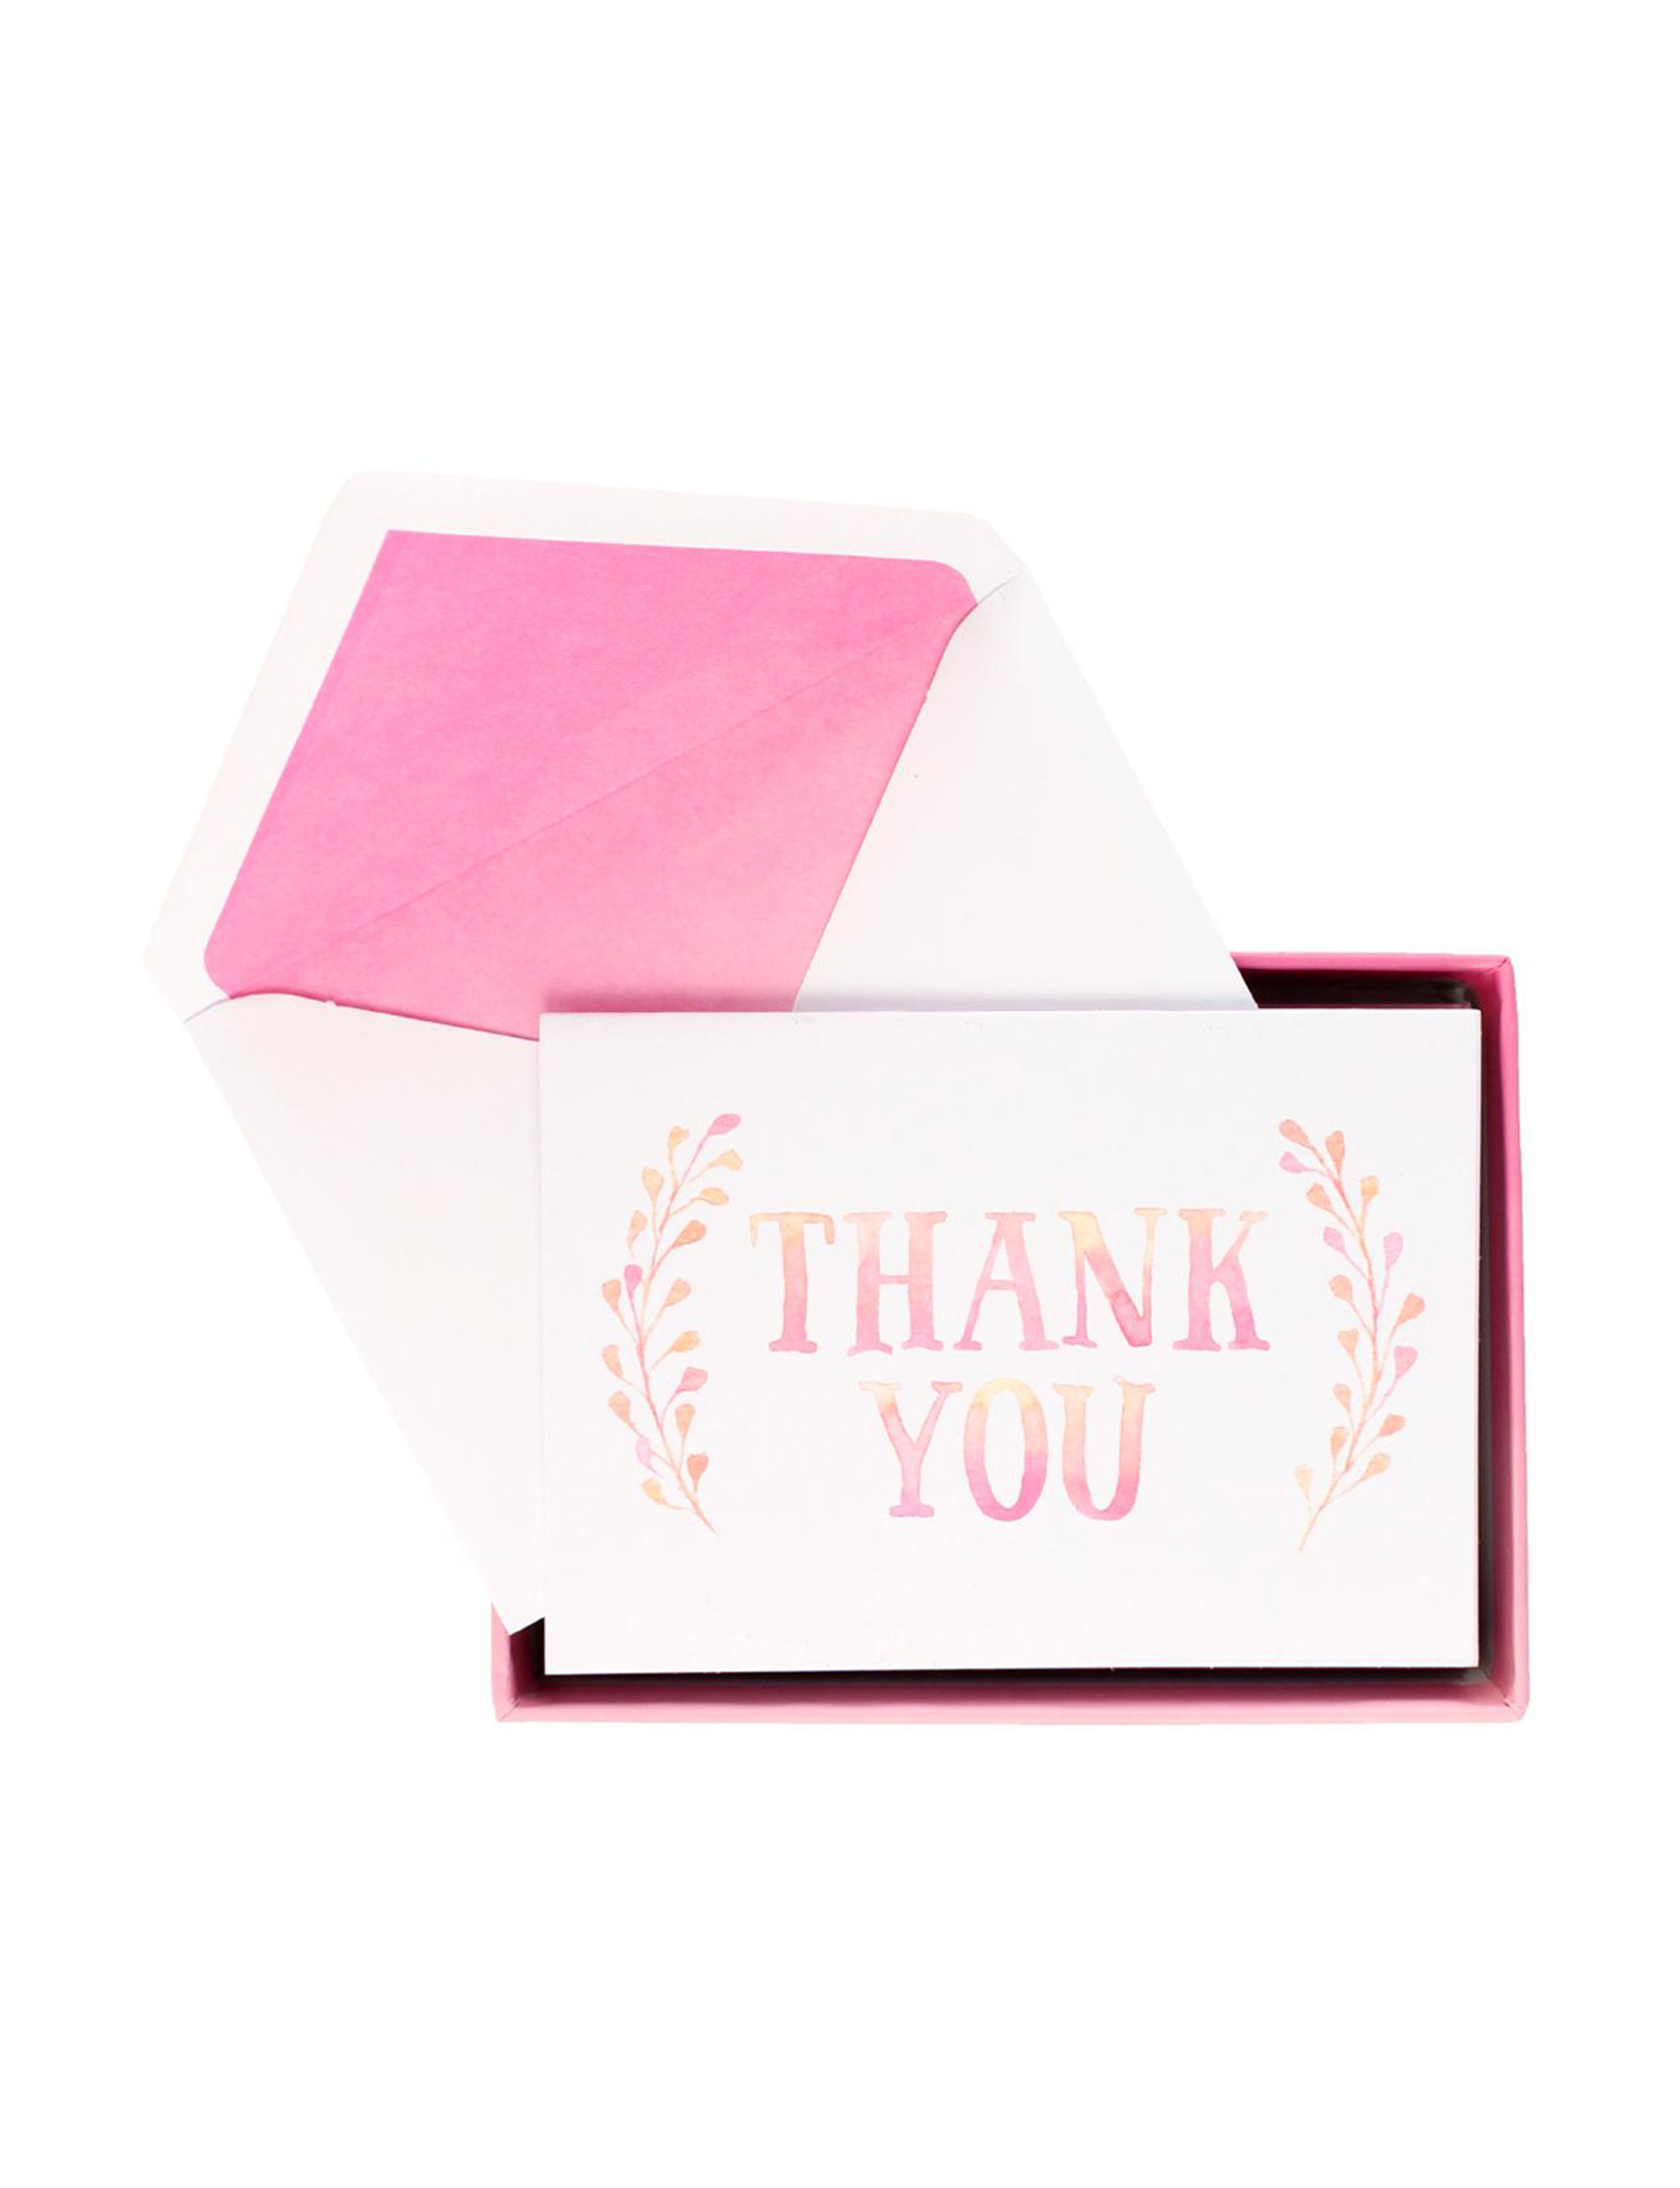 Eccolo Pink Accessories School & Office Supplies